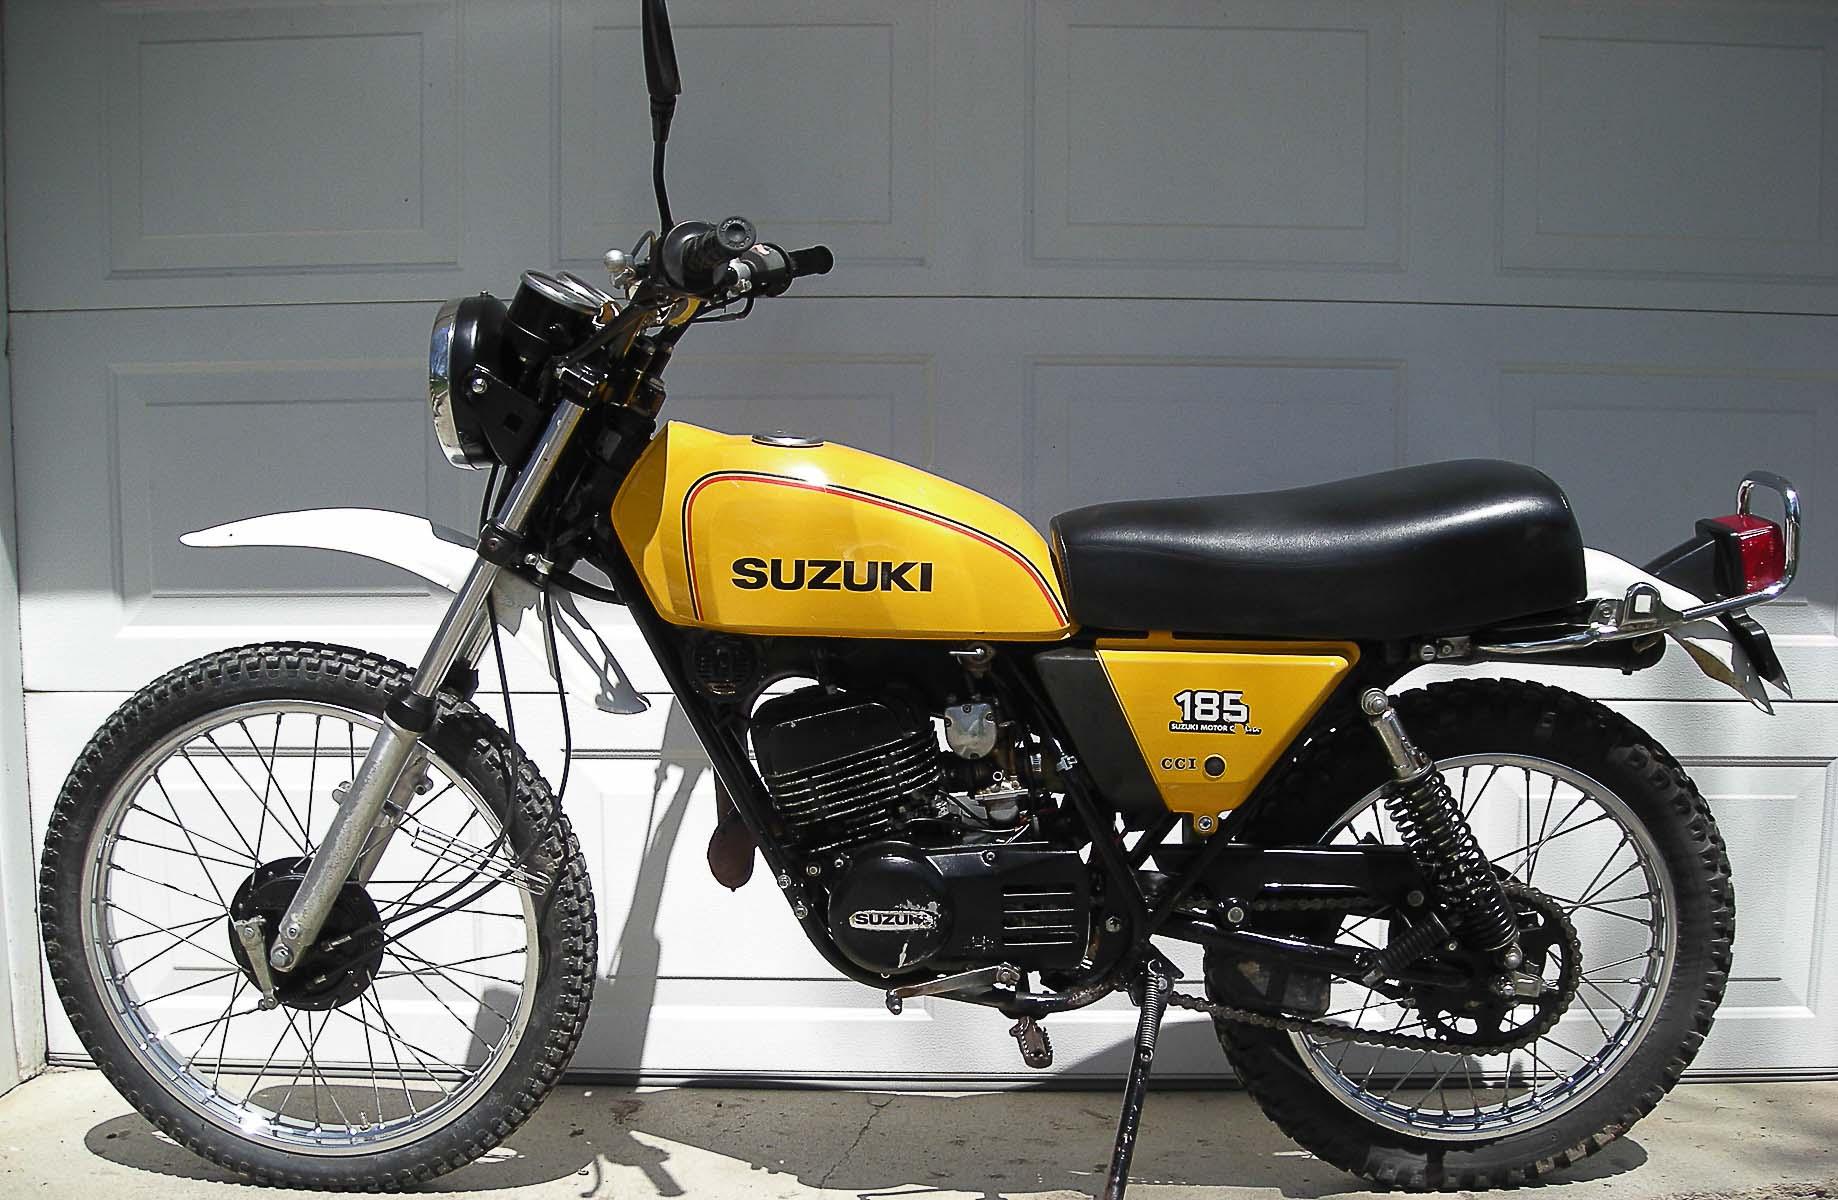 SUZUKI TS 185 (1971 - 1977)